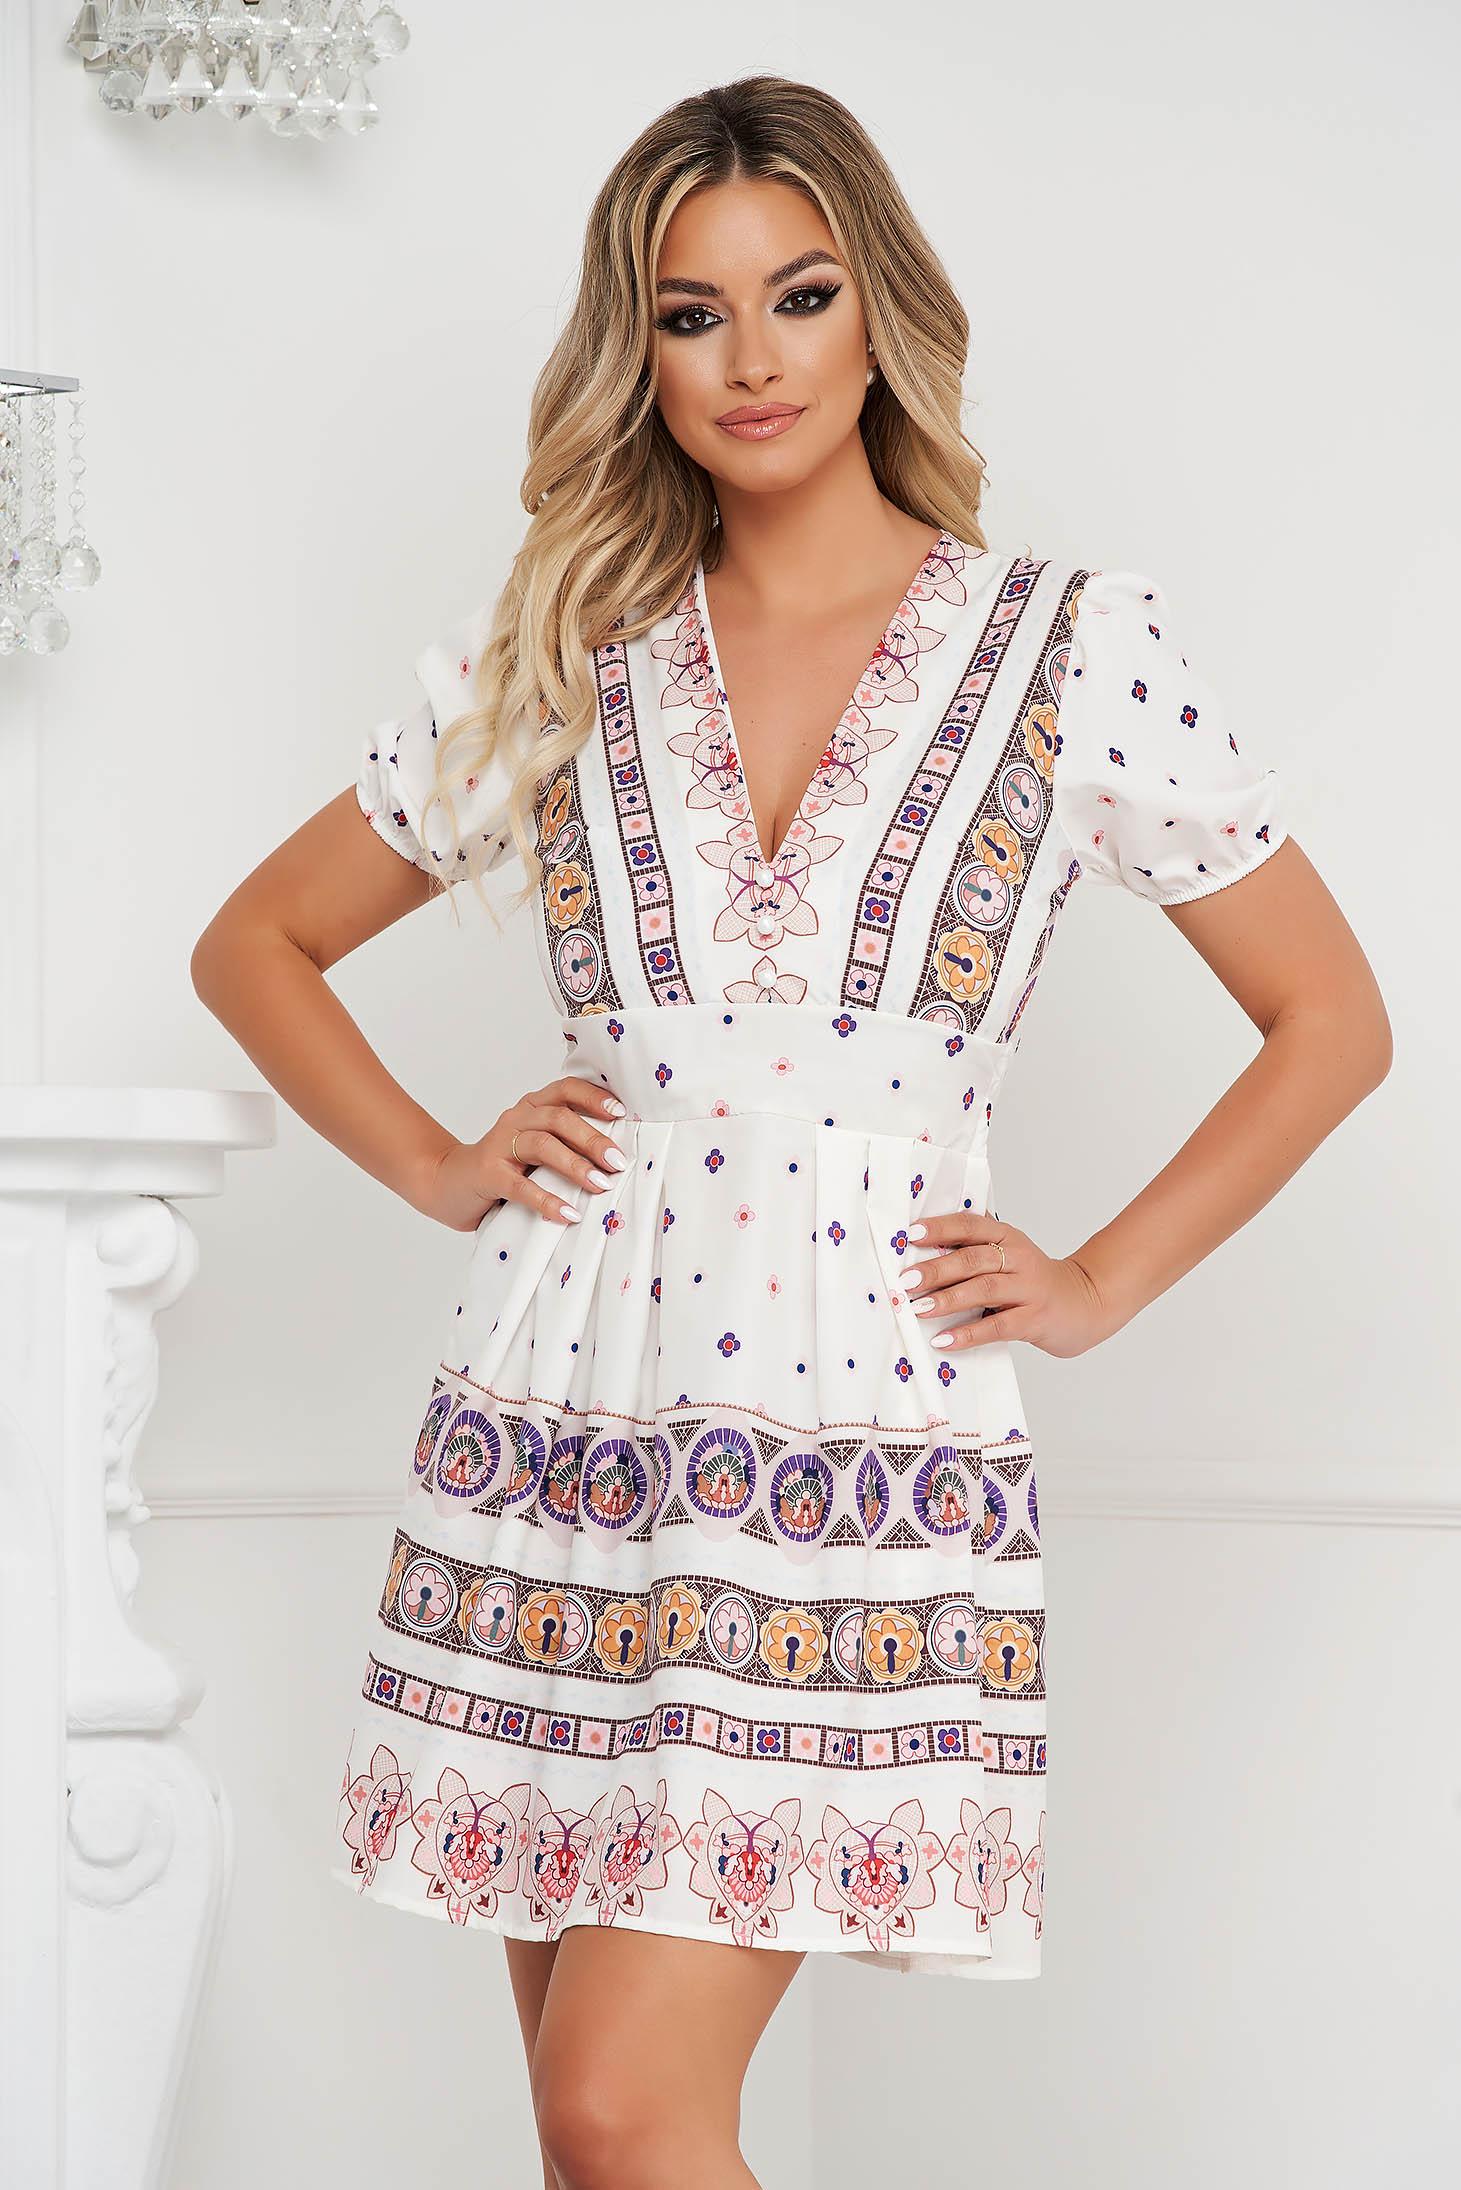 Dress short cut cloche with elastic waist short sleeves elastic held sleeves